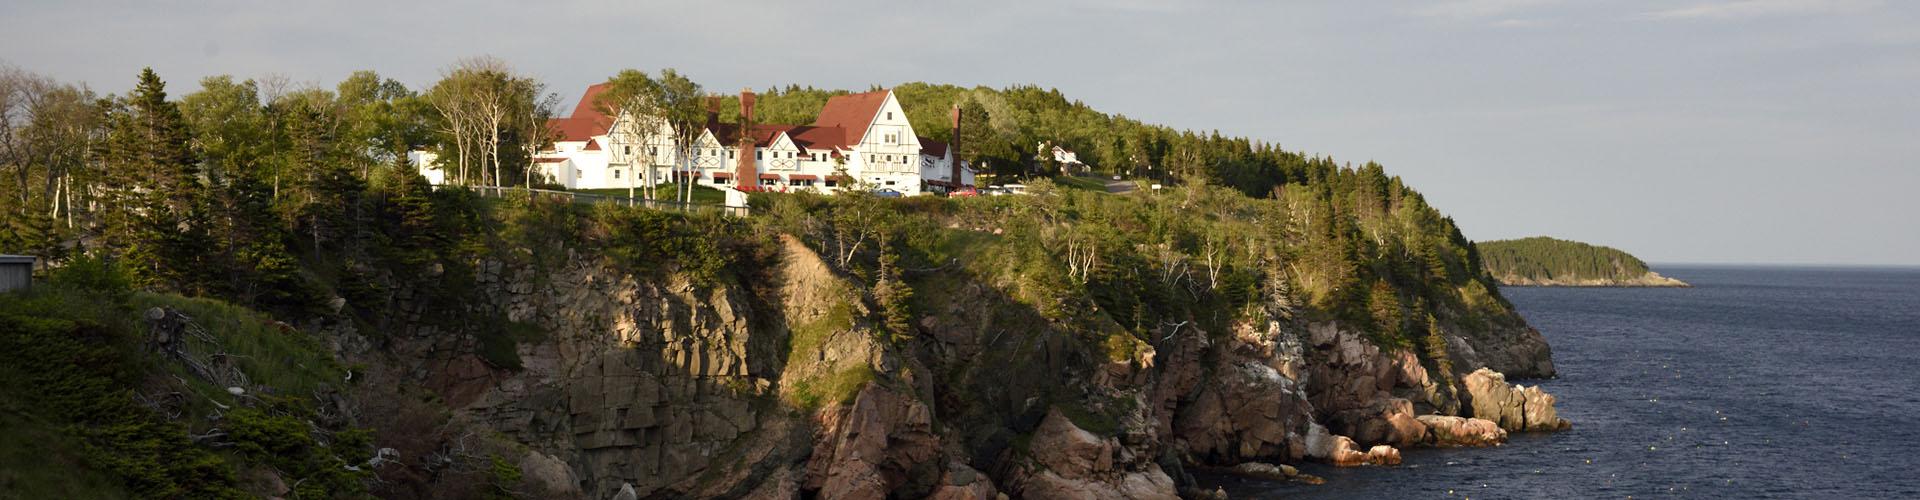 Keltic Lodge, Cape Breton, Canada